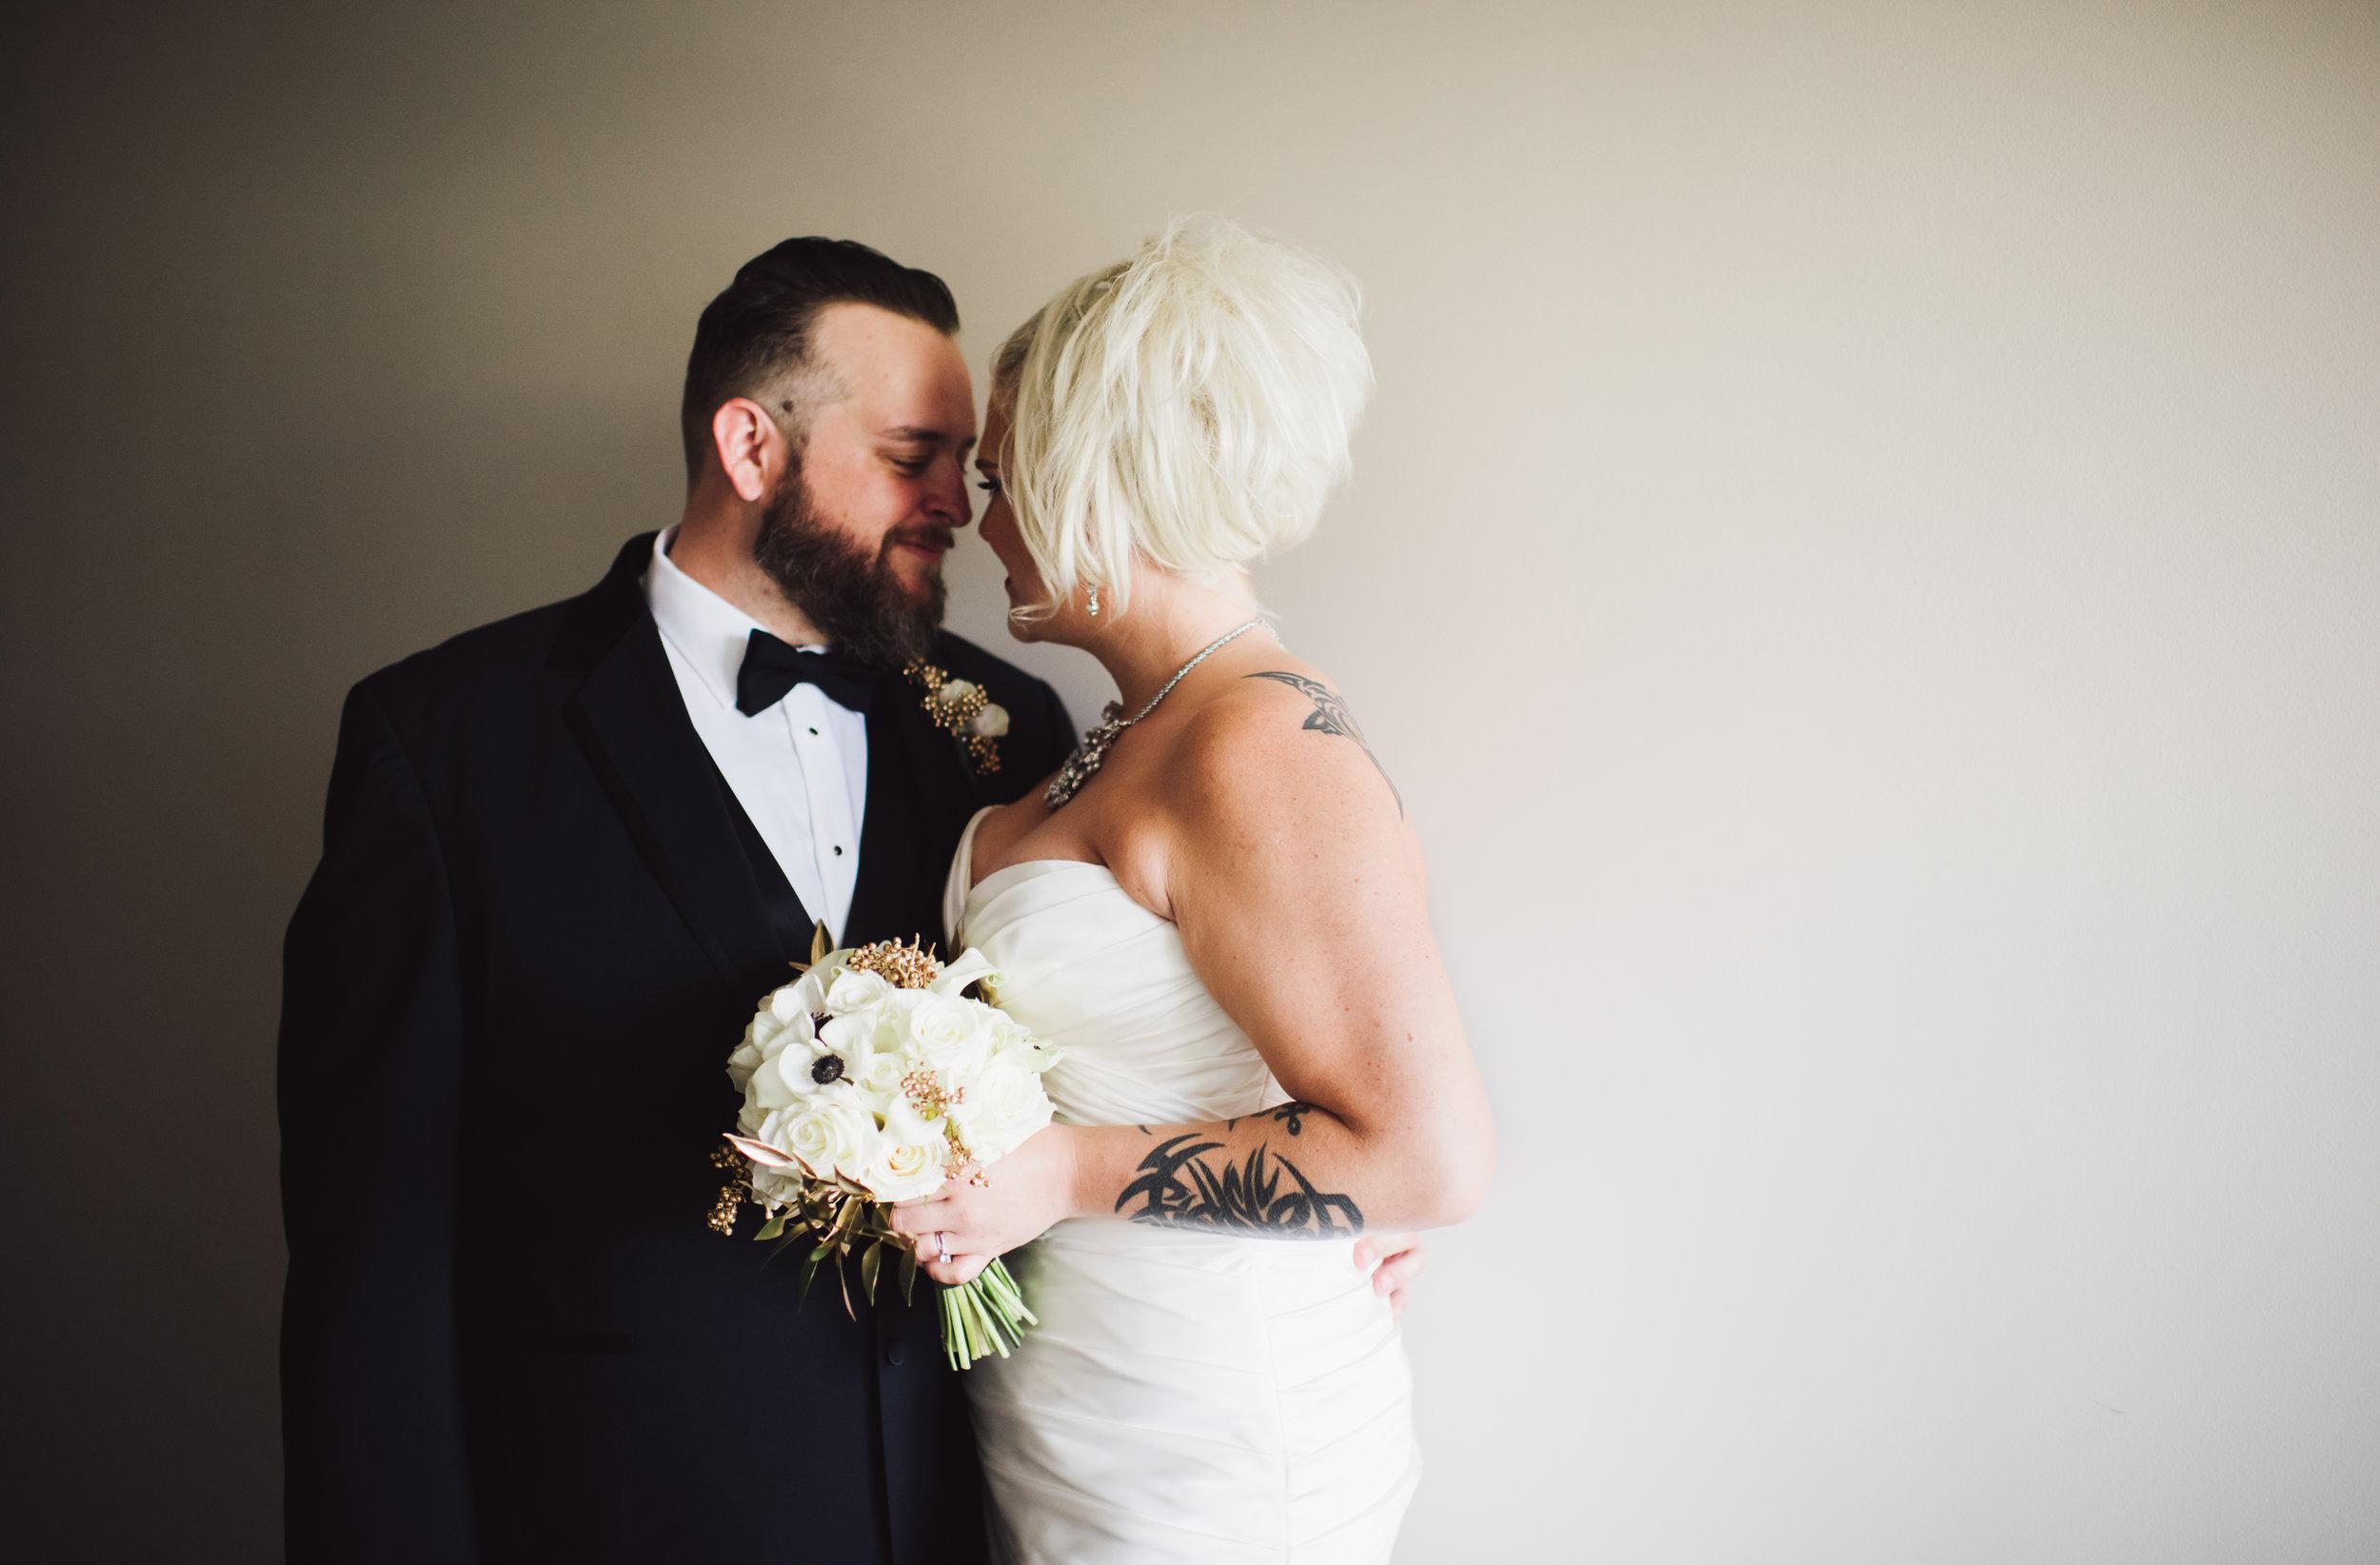 SHEILA & ROD WEDDING - INTIMATE WEDDING PHOTOGRAPHER - CHI-CHI ARI-1.jpg